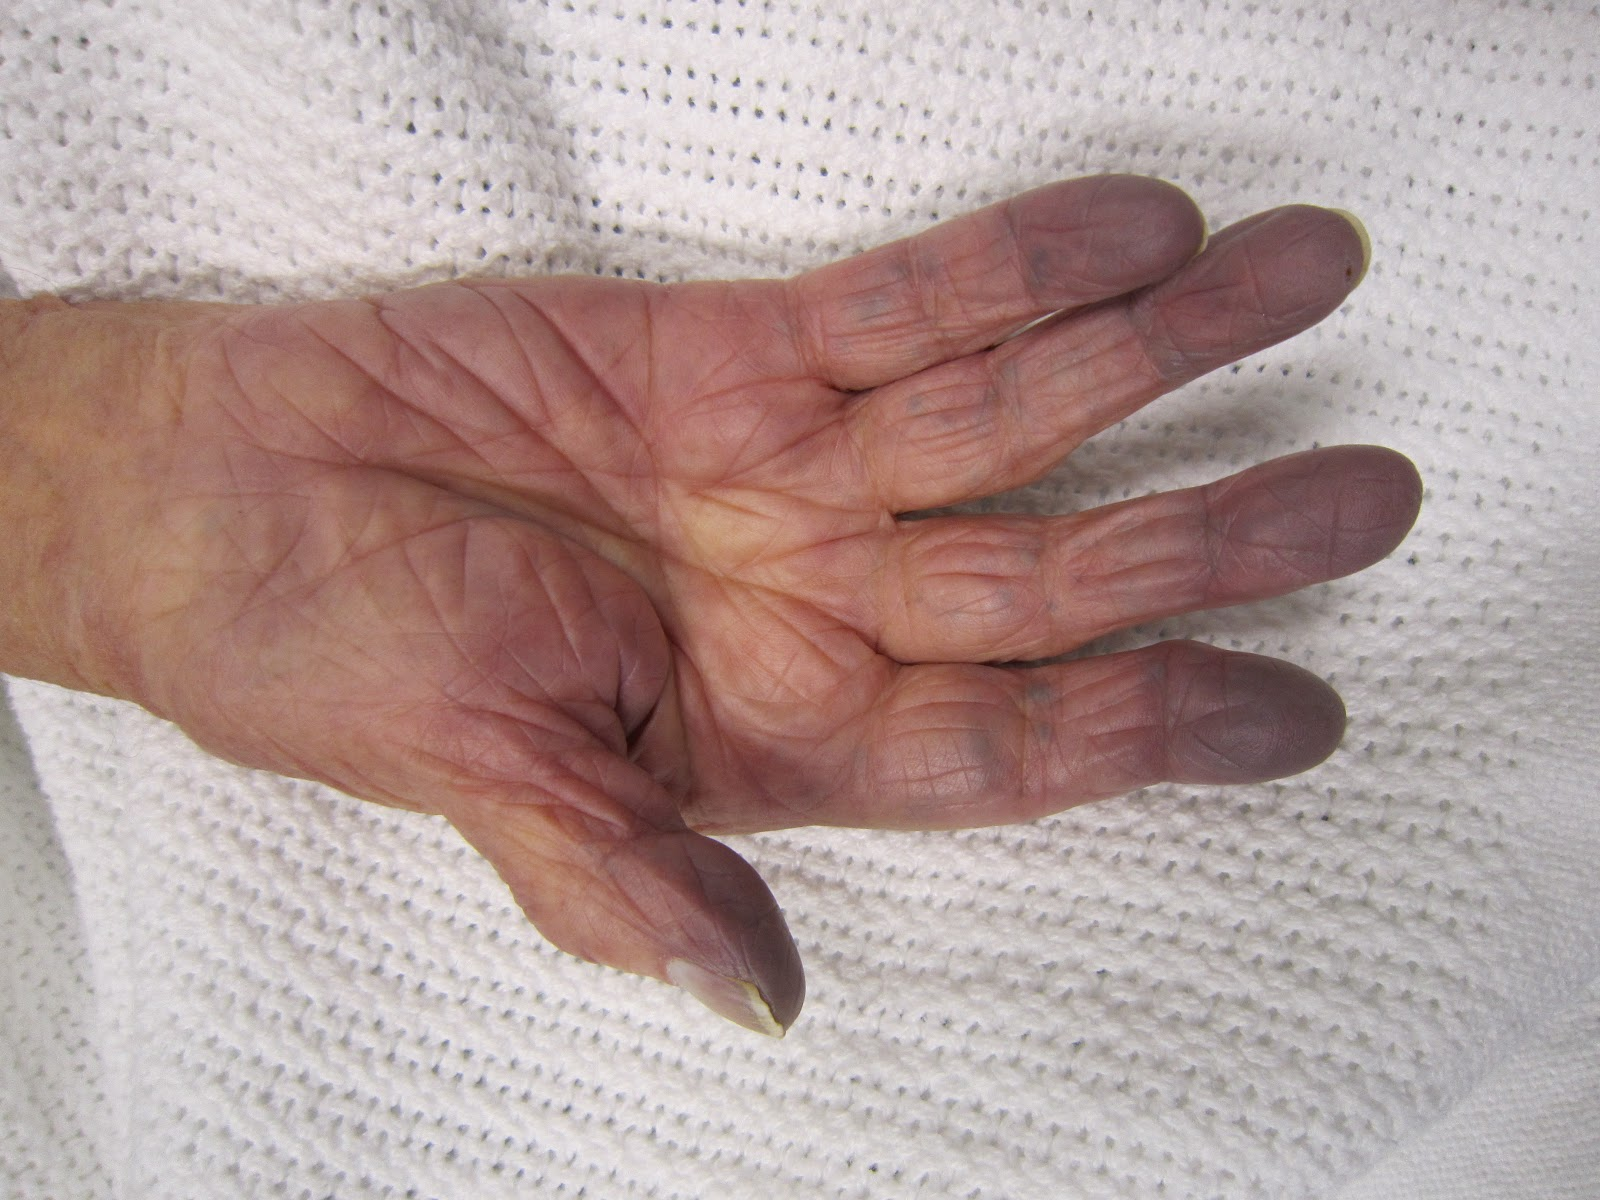 hand with bluish skin showing cyanosis